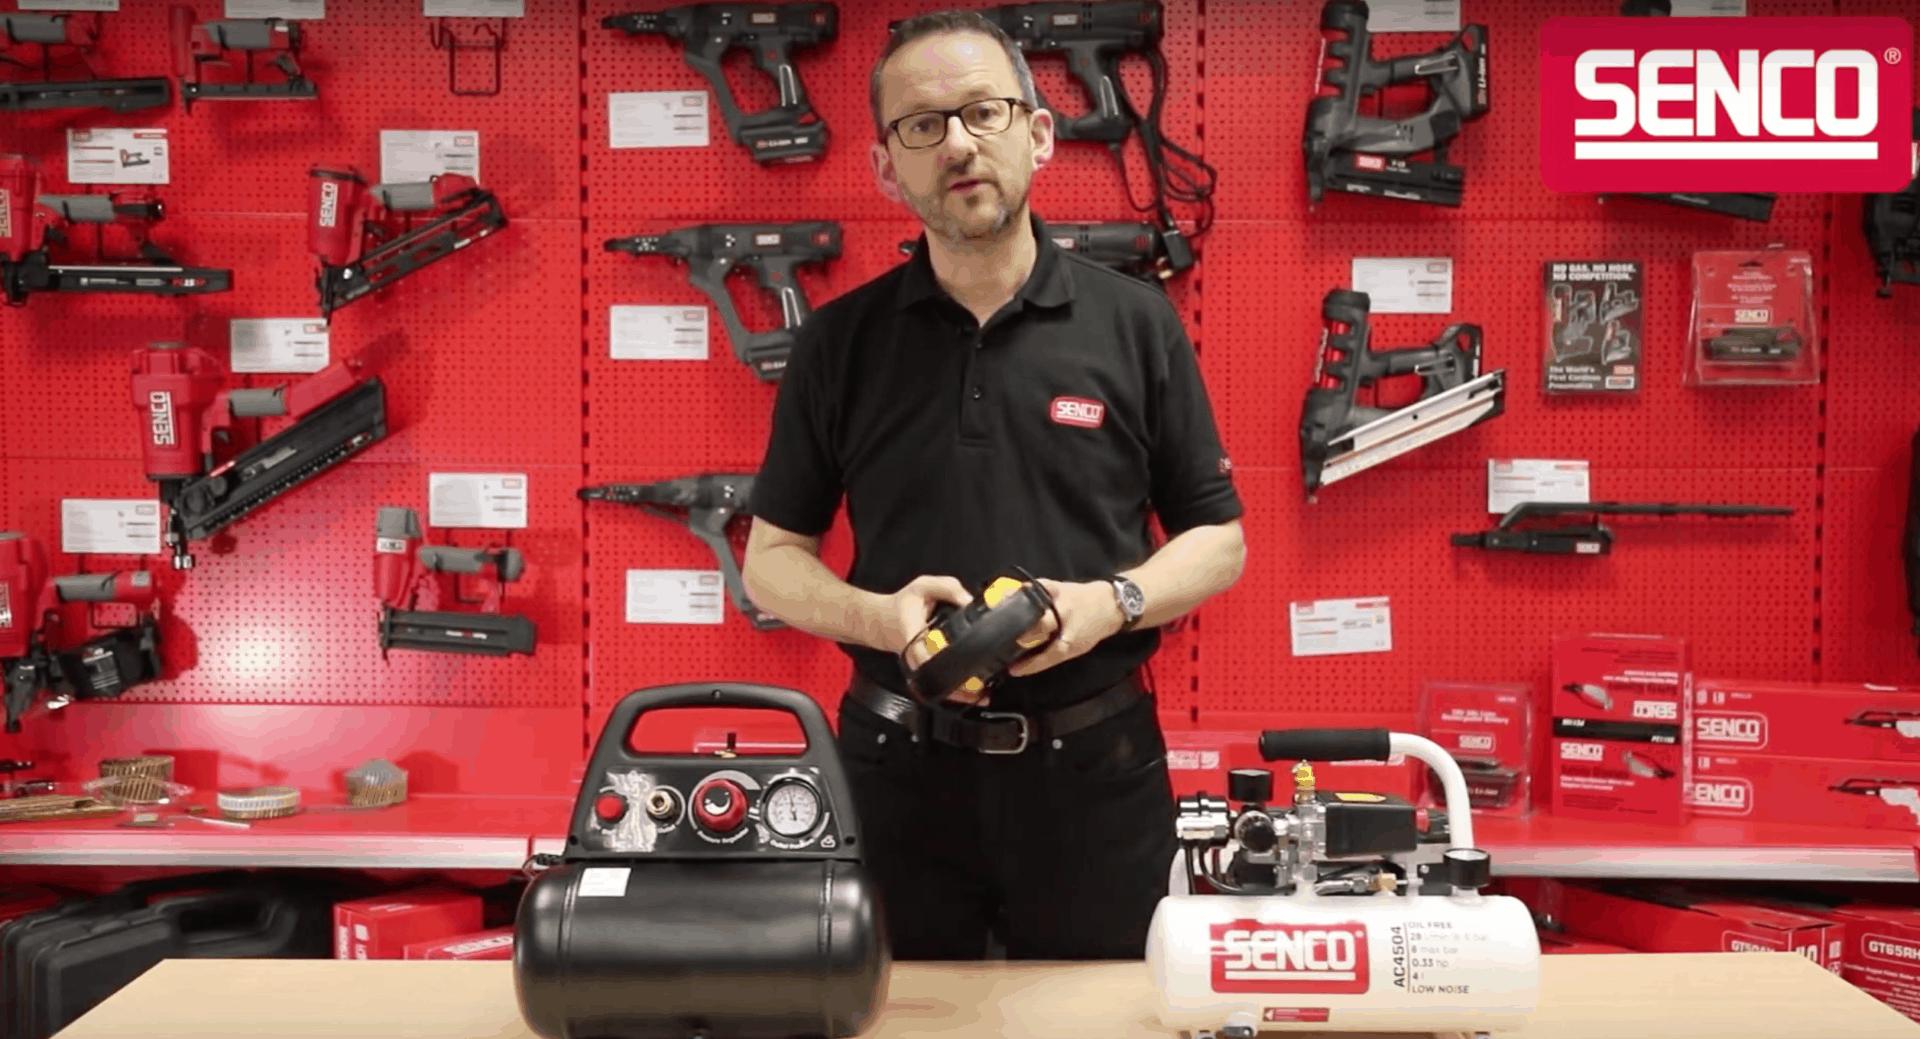 Kyocera Senco Low Noise Compressor